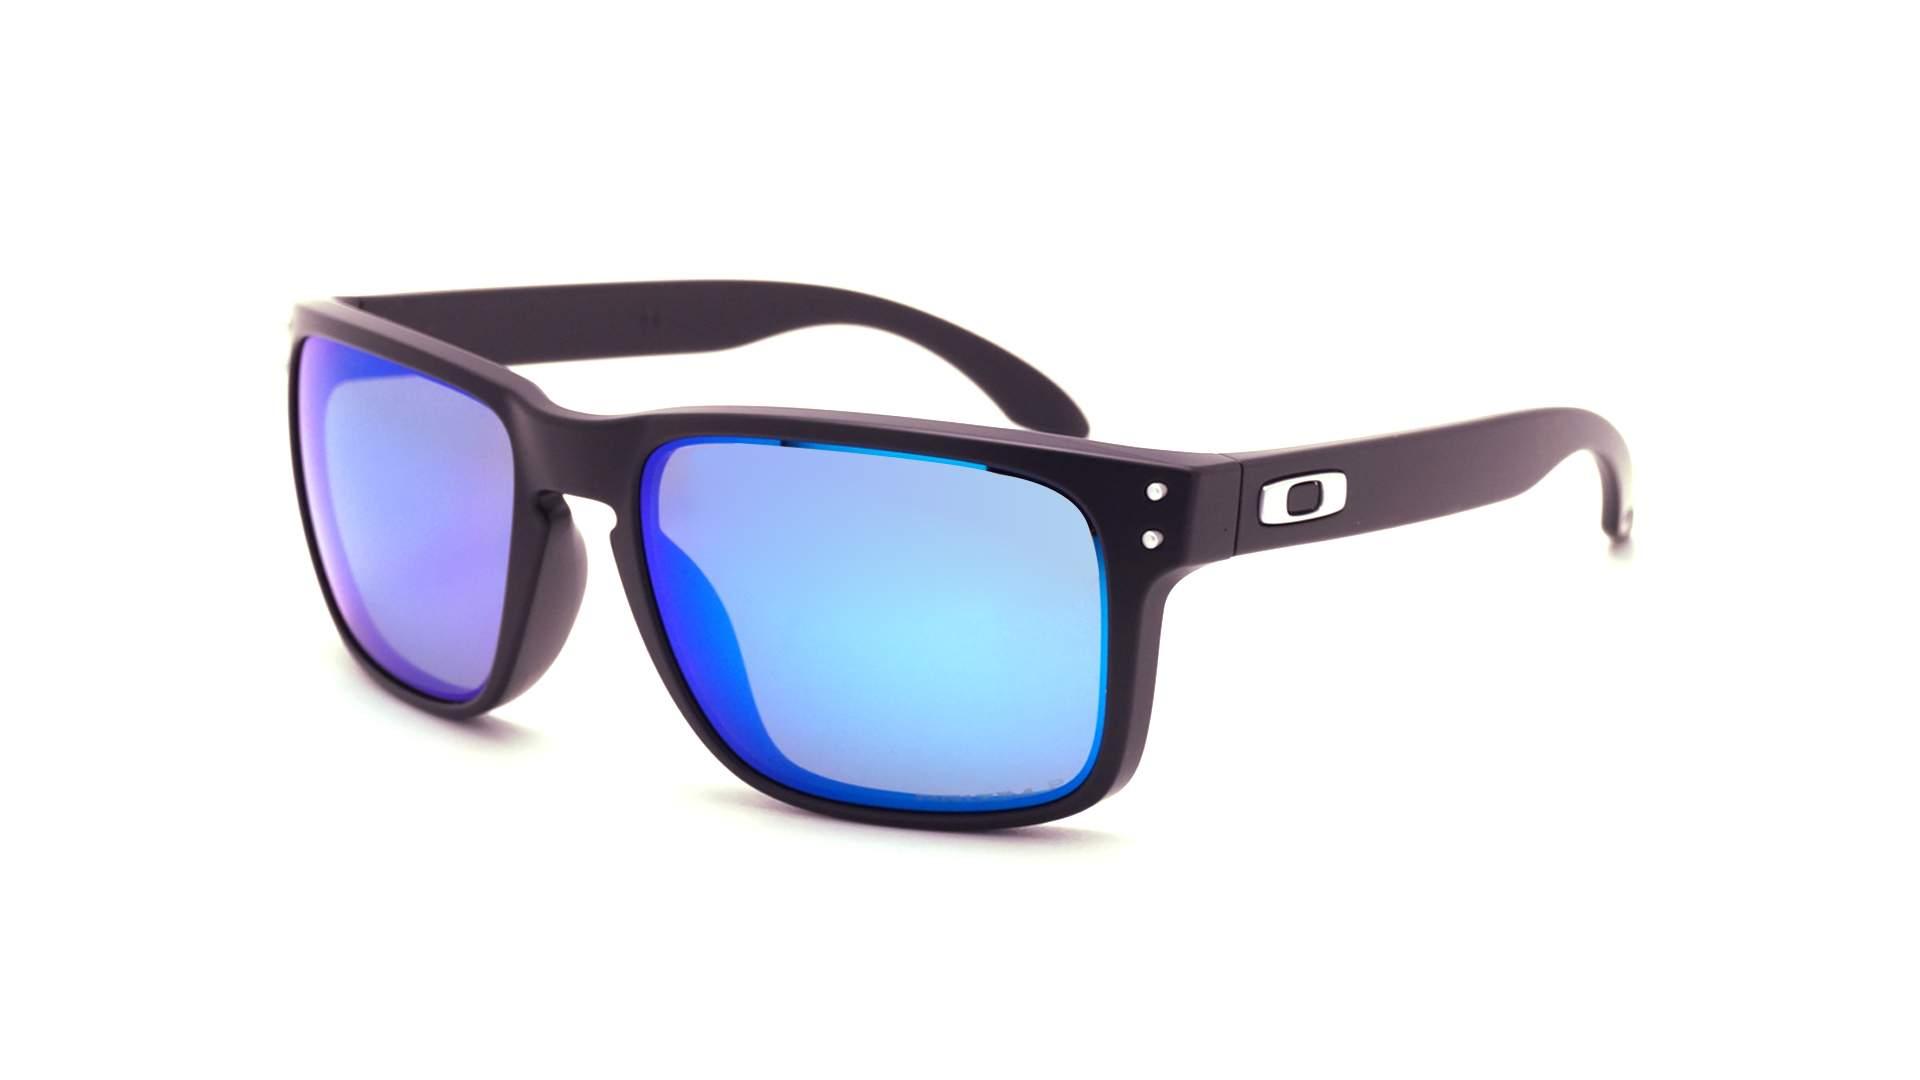 b207f333fd Sunglasses Oakley Holbrook Black Matte Prizm OO9102 F0 57-18 Medium  Polarized Mirror